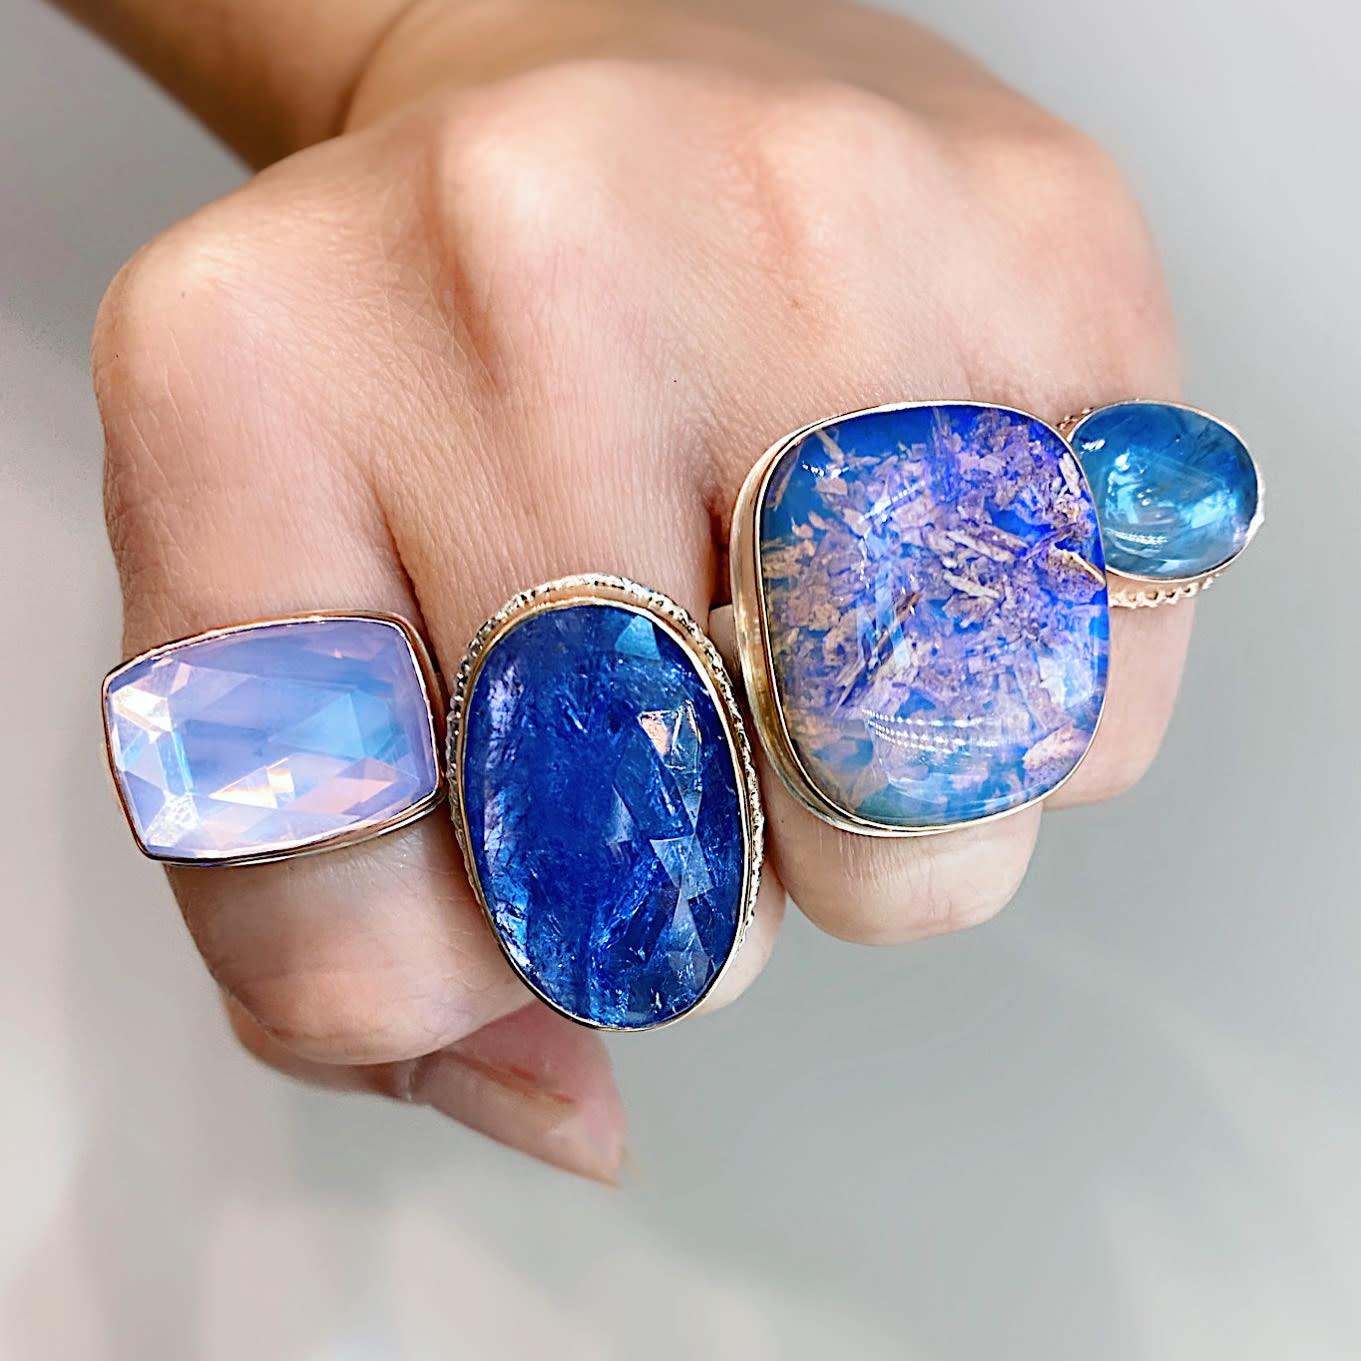 Jamie Joseph Jewelry Designs Faceted Tanzanite Bezel Statement Ring